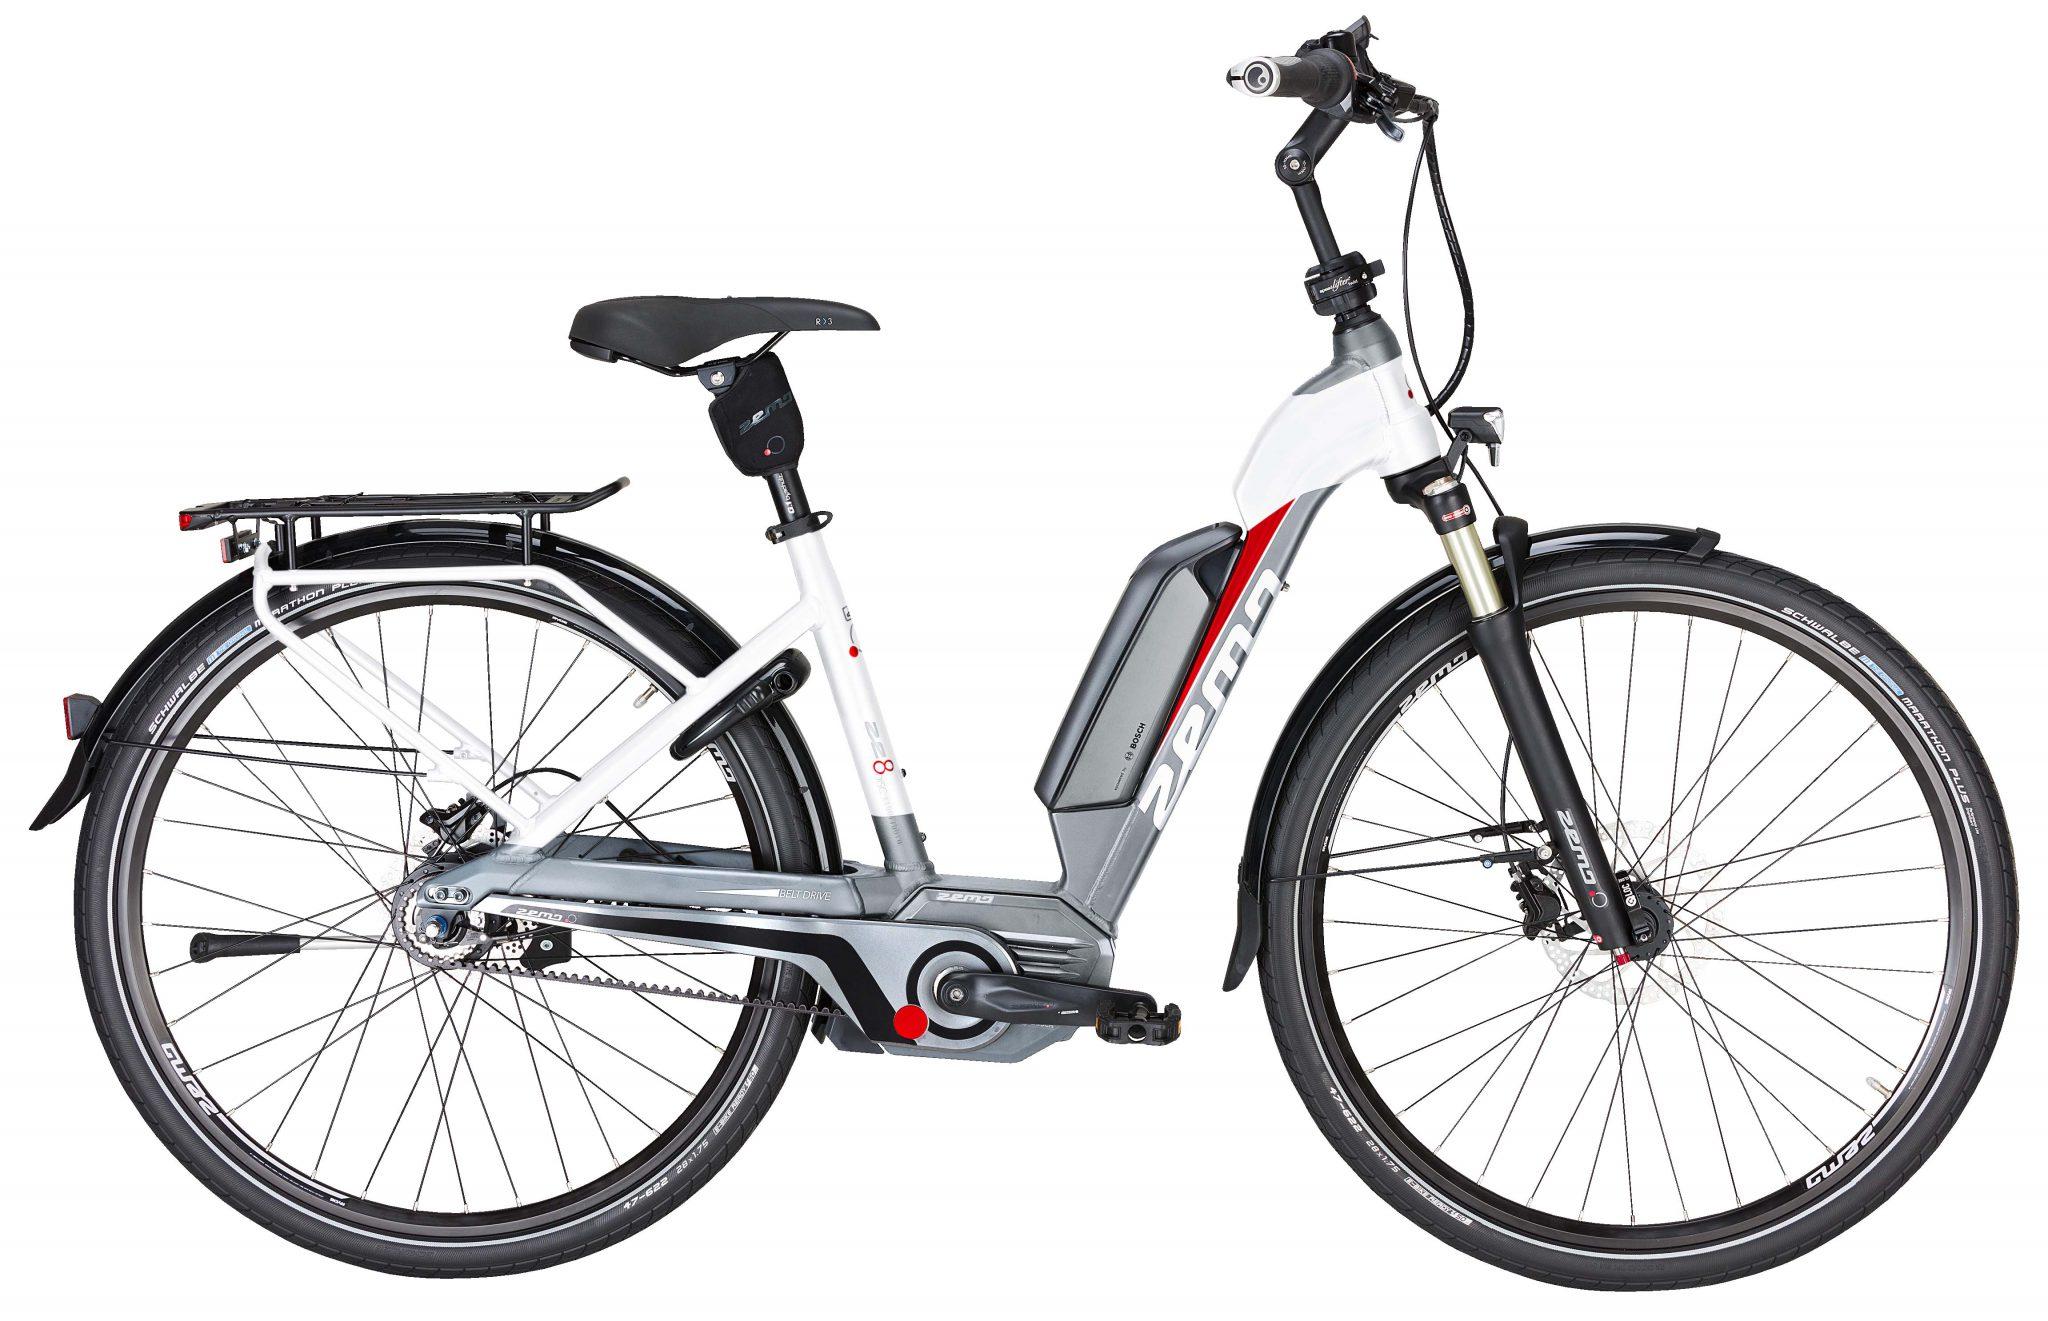 Zemo 8 Disc Lady City Bike da Donna telaio Onda motore Bosch